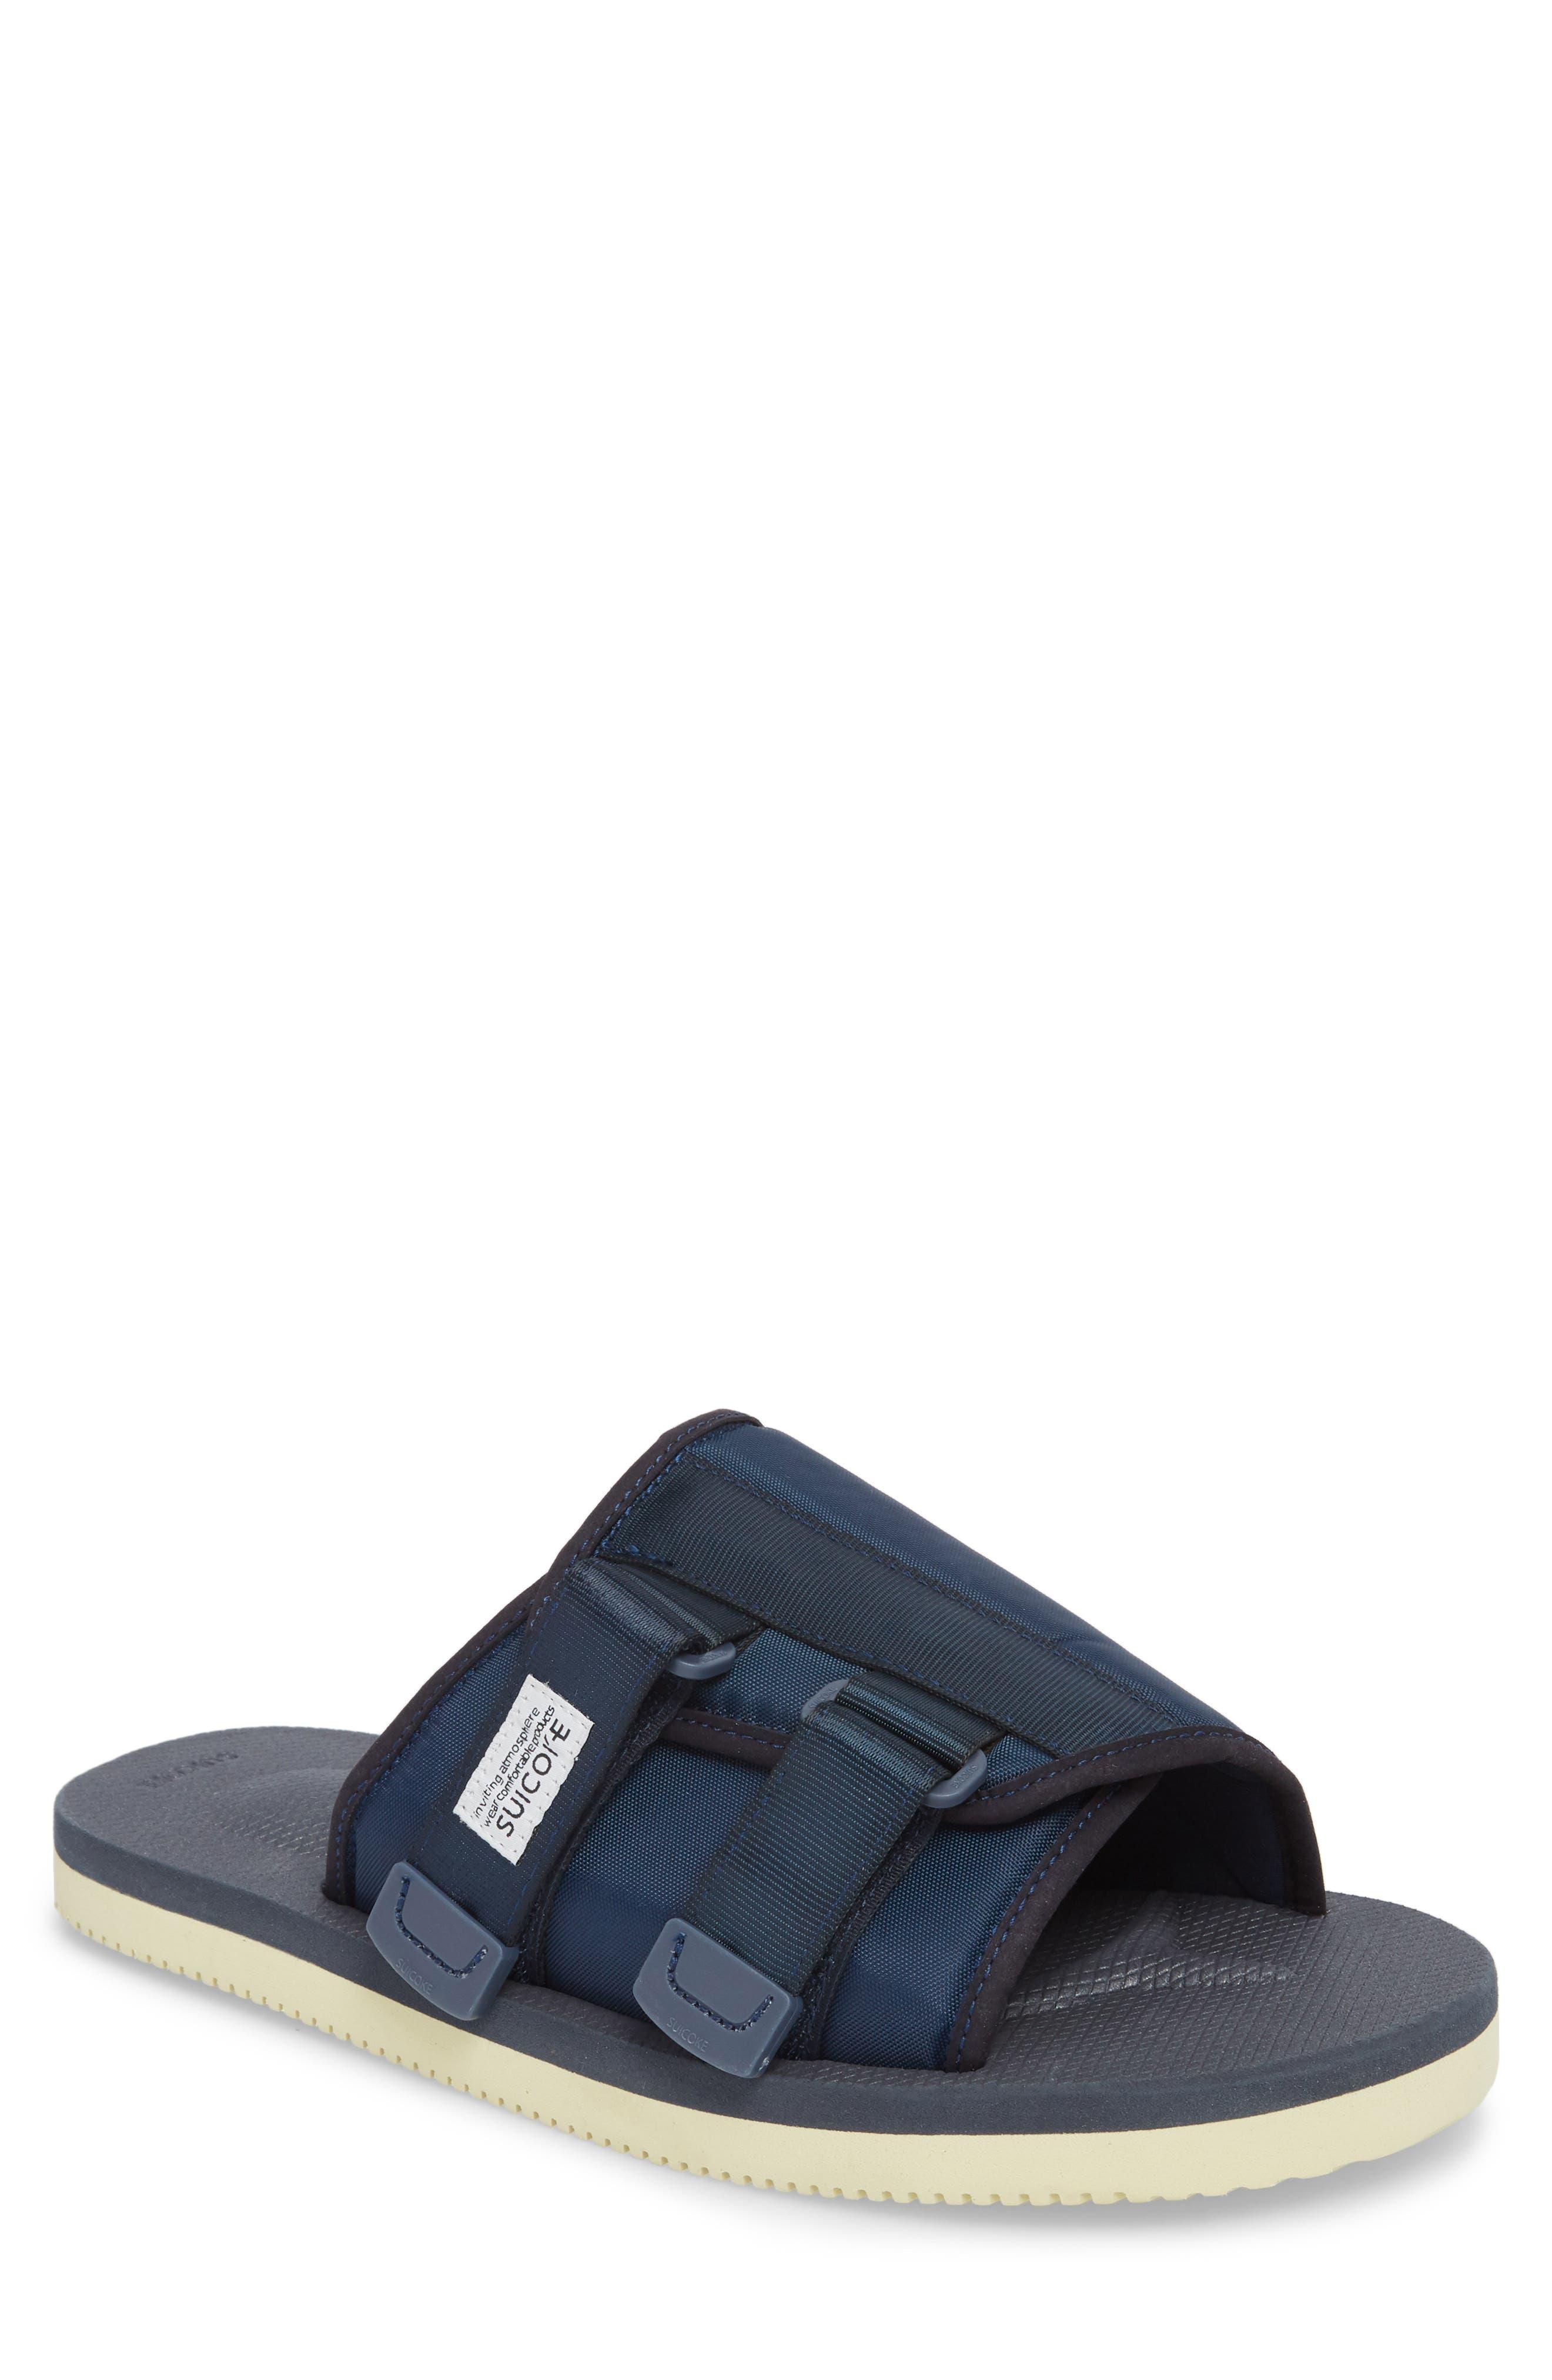 Kaw Cab Slide Sandal,                             Main thumbnail 1, color,                             Navy